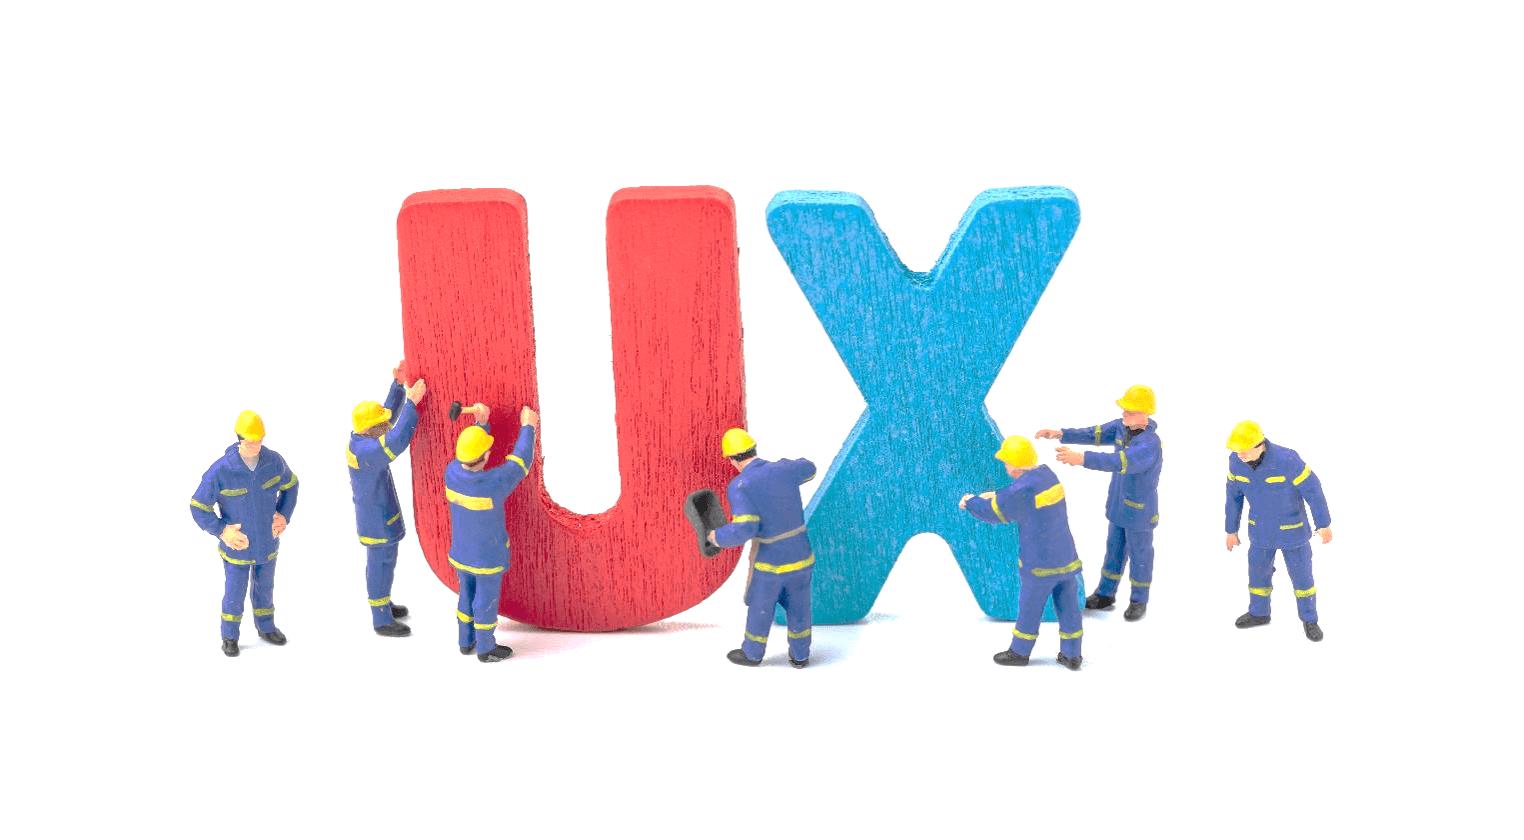 user-centricity